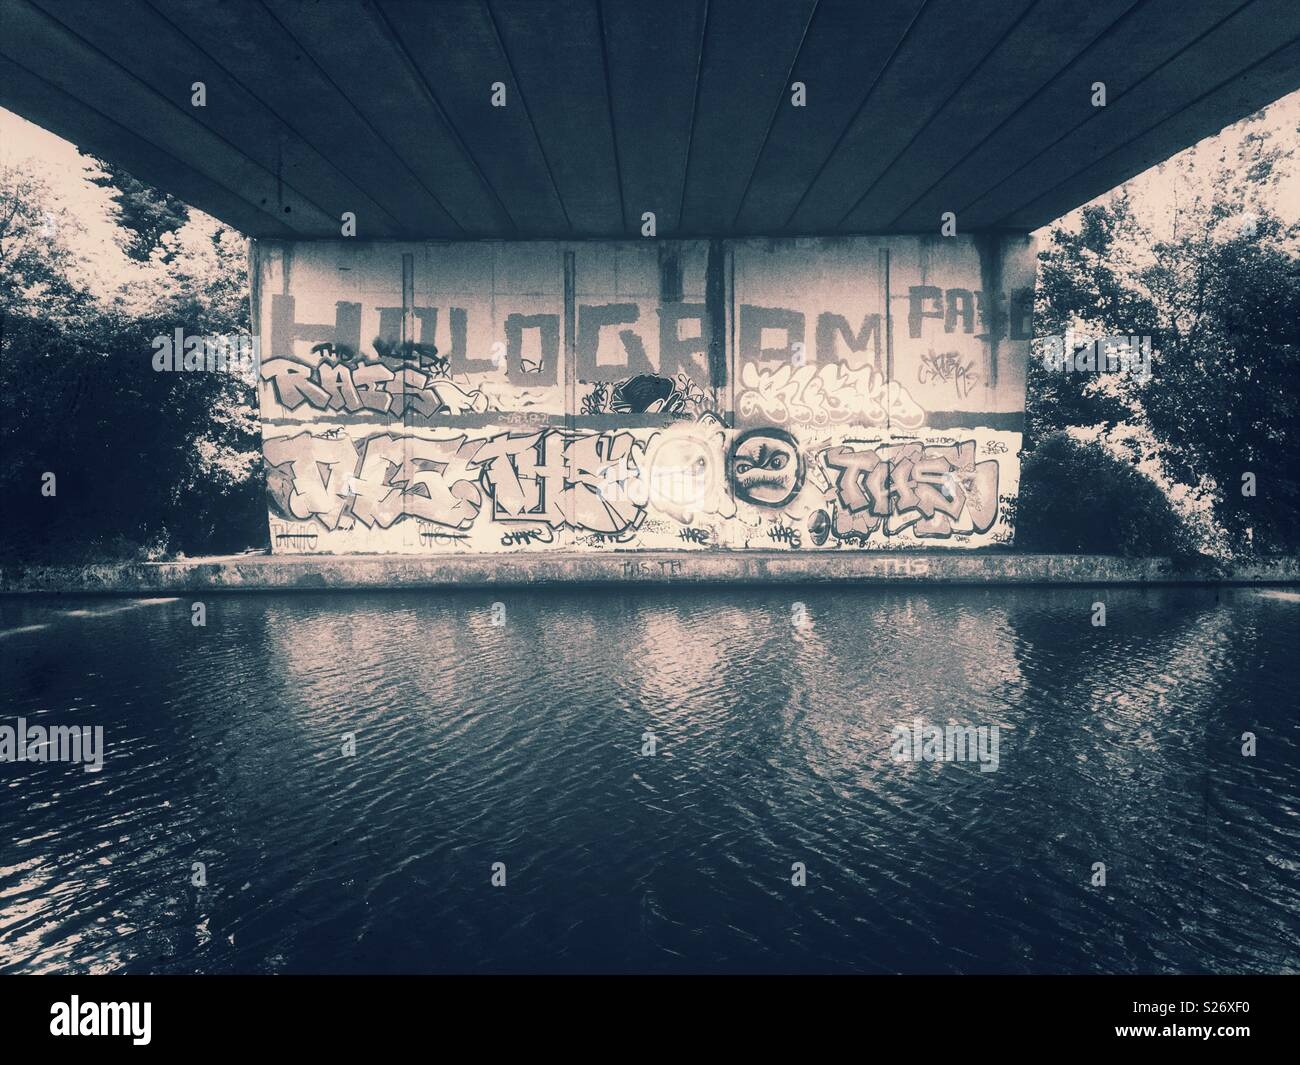 Graffiti - Stock Image